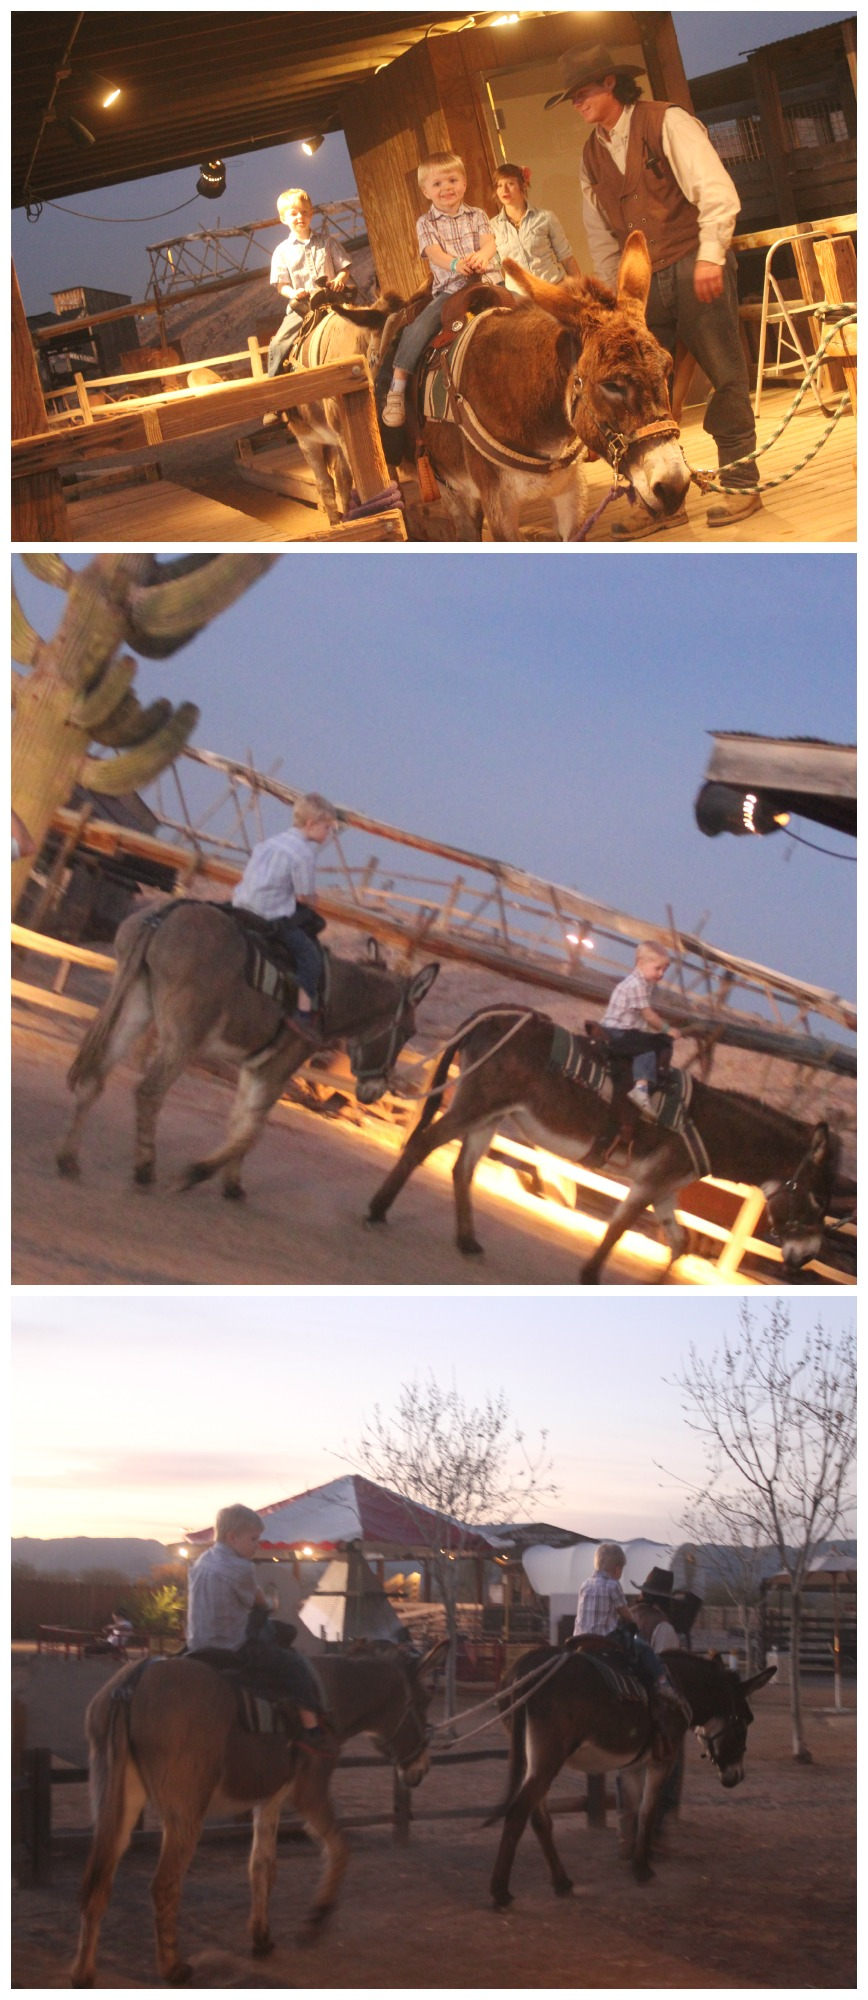 Burro Rides at Rawhide